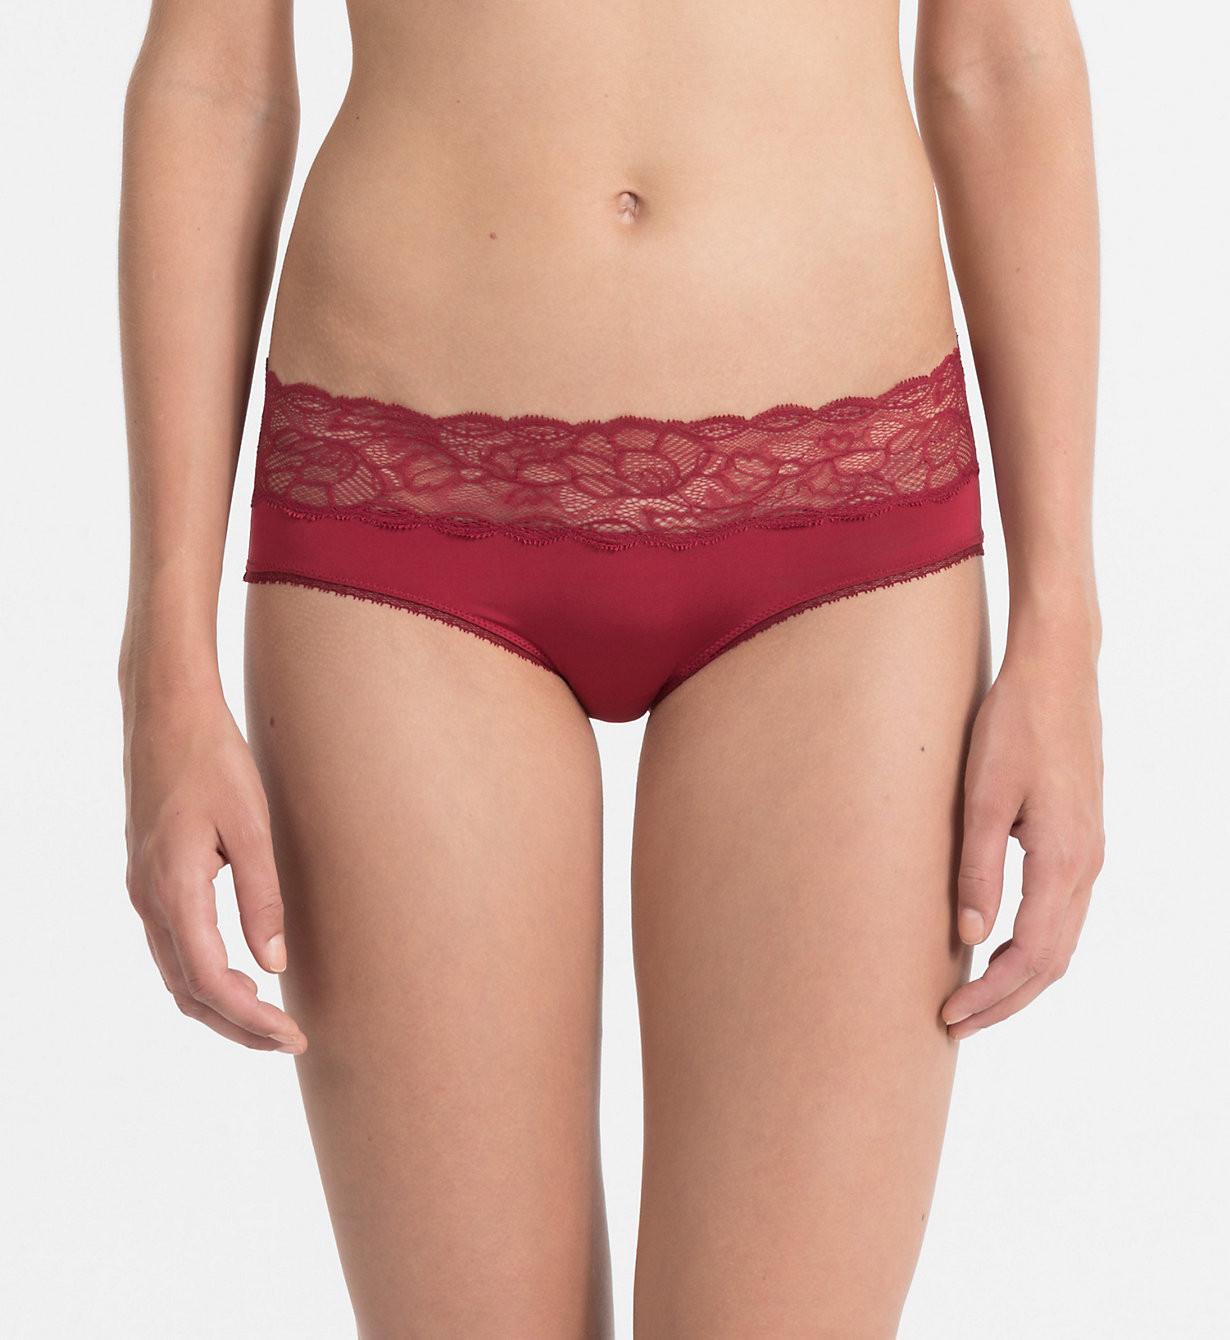 Kalhotky Seductive Comfort QF1586E - Calvin Klein Barva: červená, Velikost: S